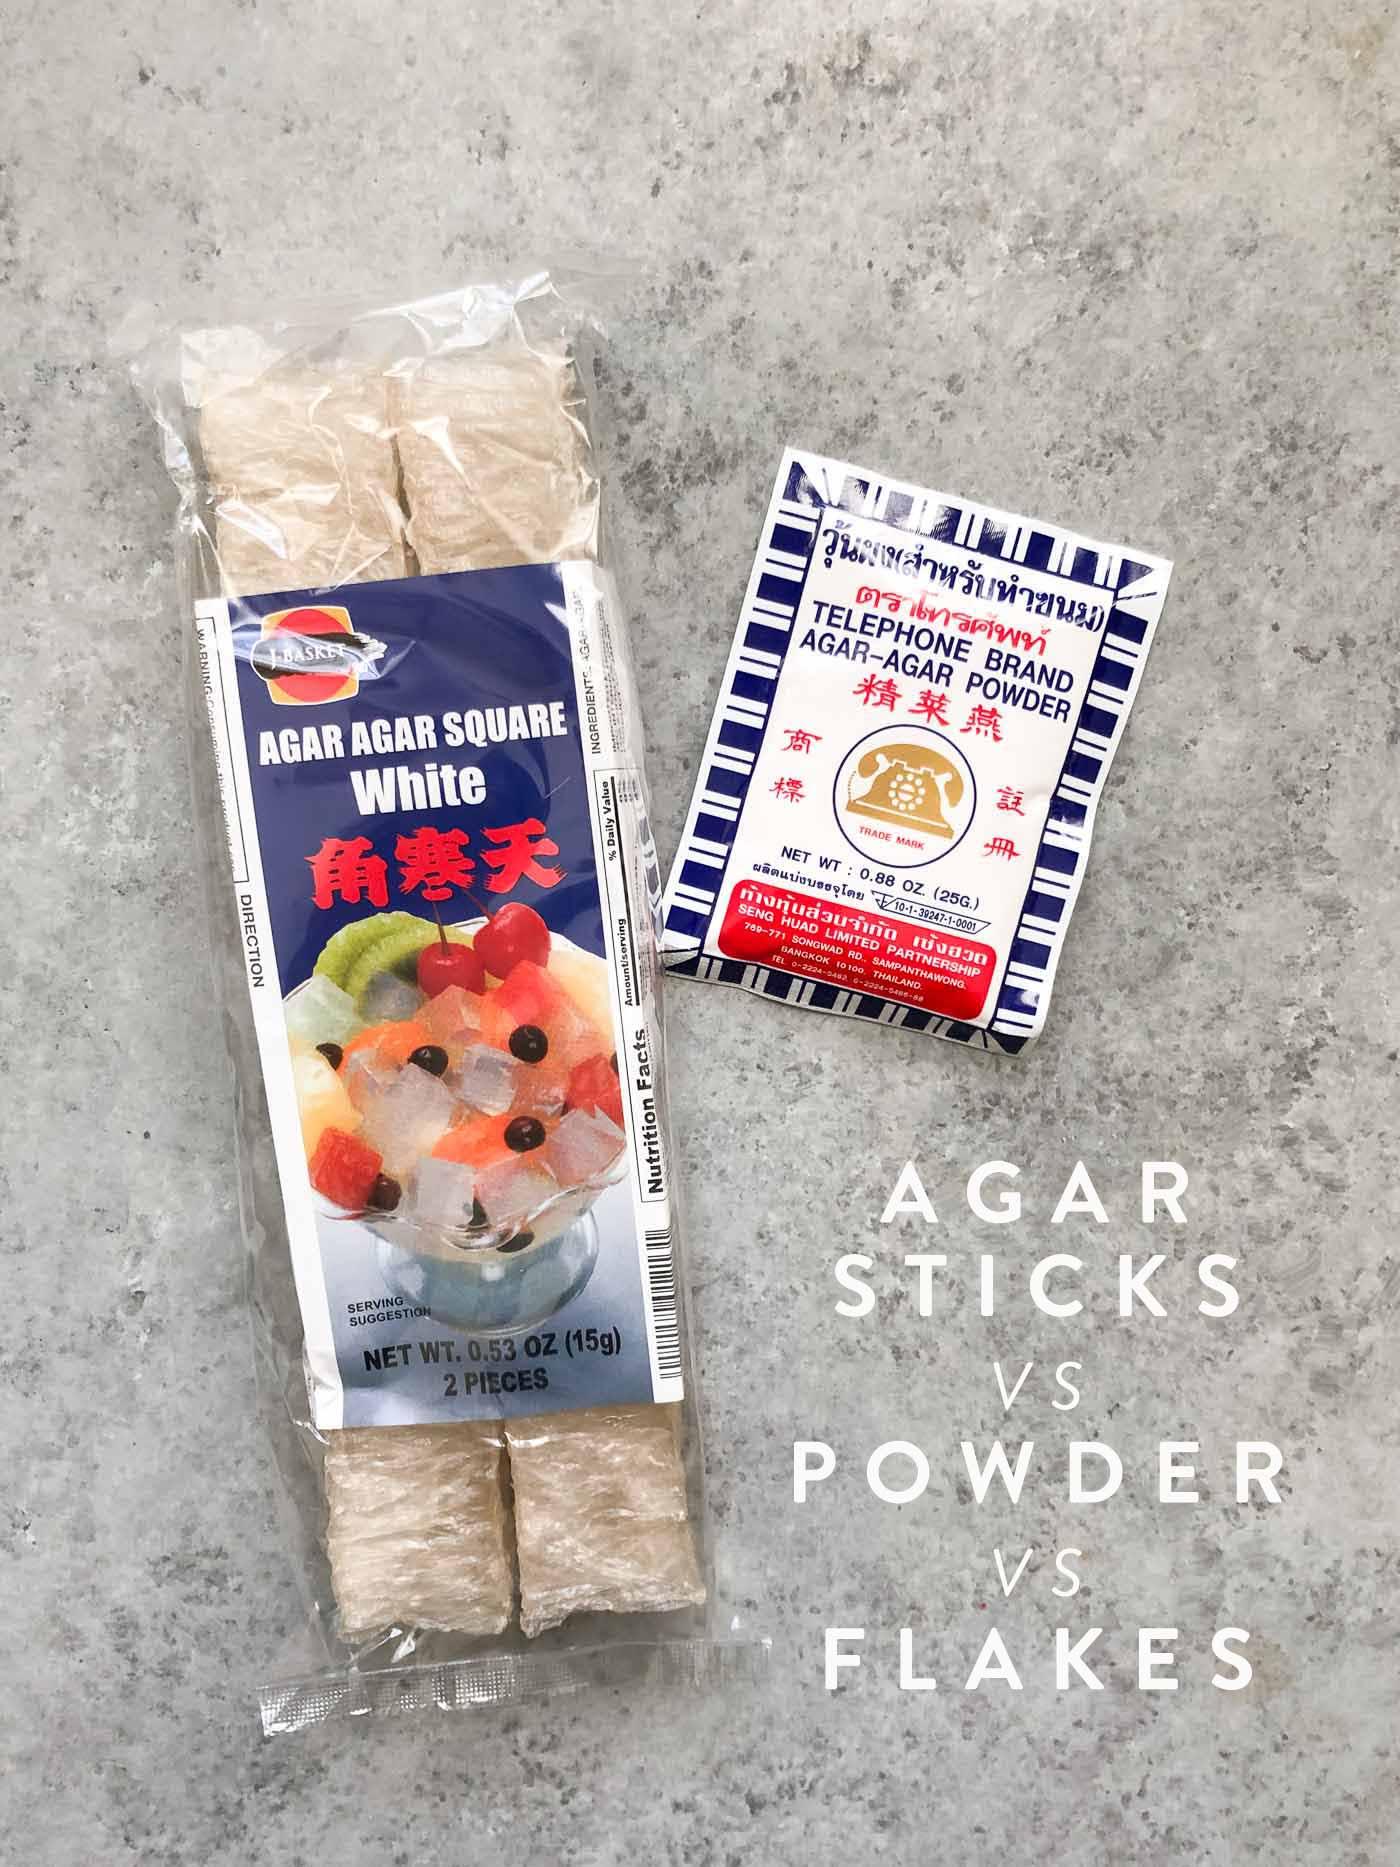 Agar sticks vs agar powder as vegan alternative to gelatin